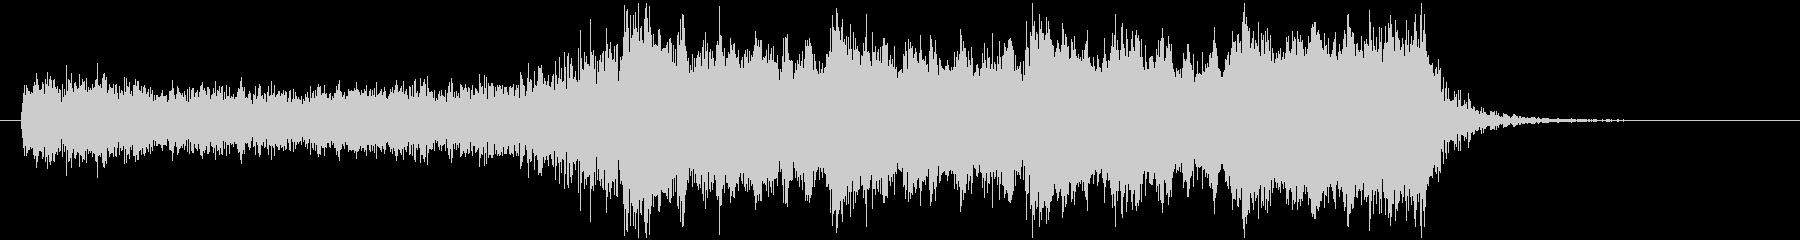 YouTube 結果発表!ドラムロール有の未再生の波形